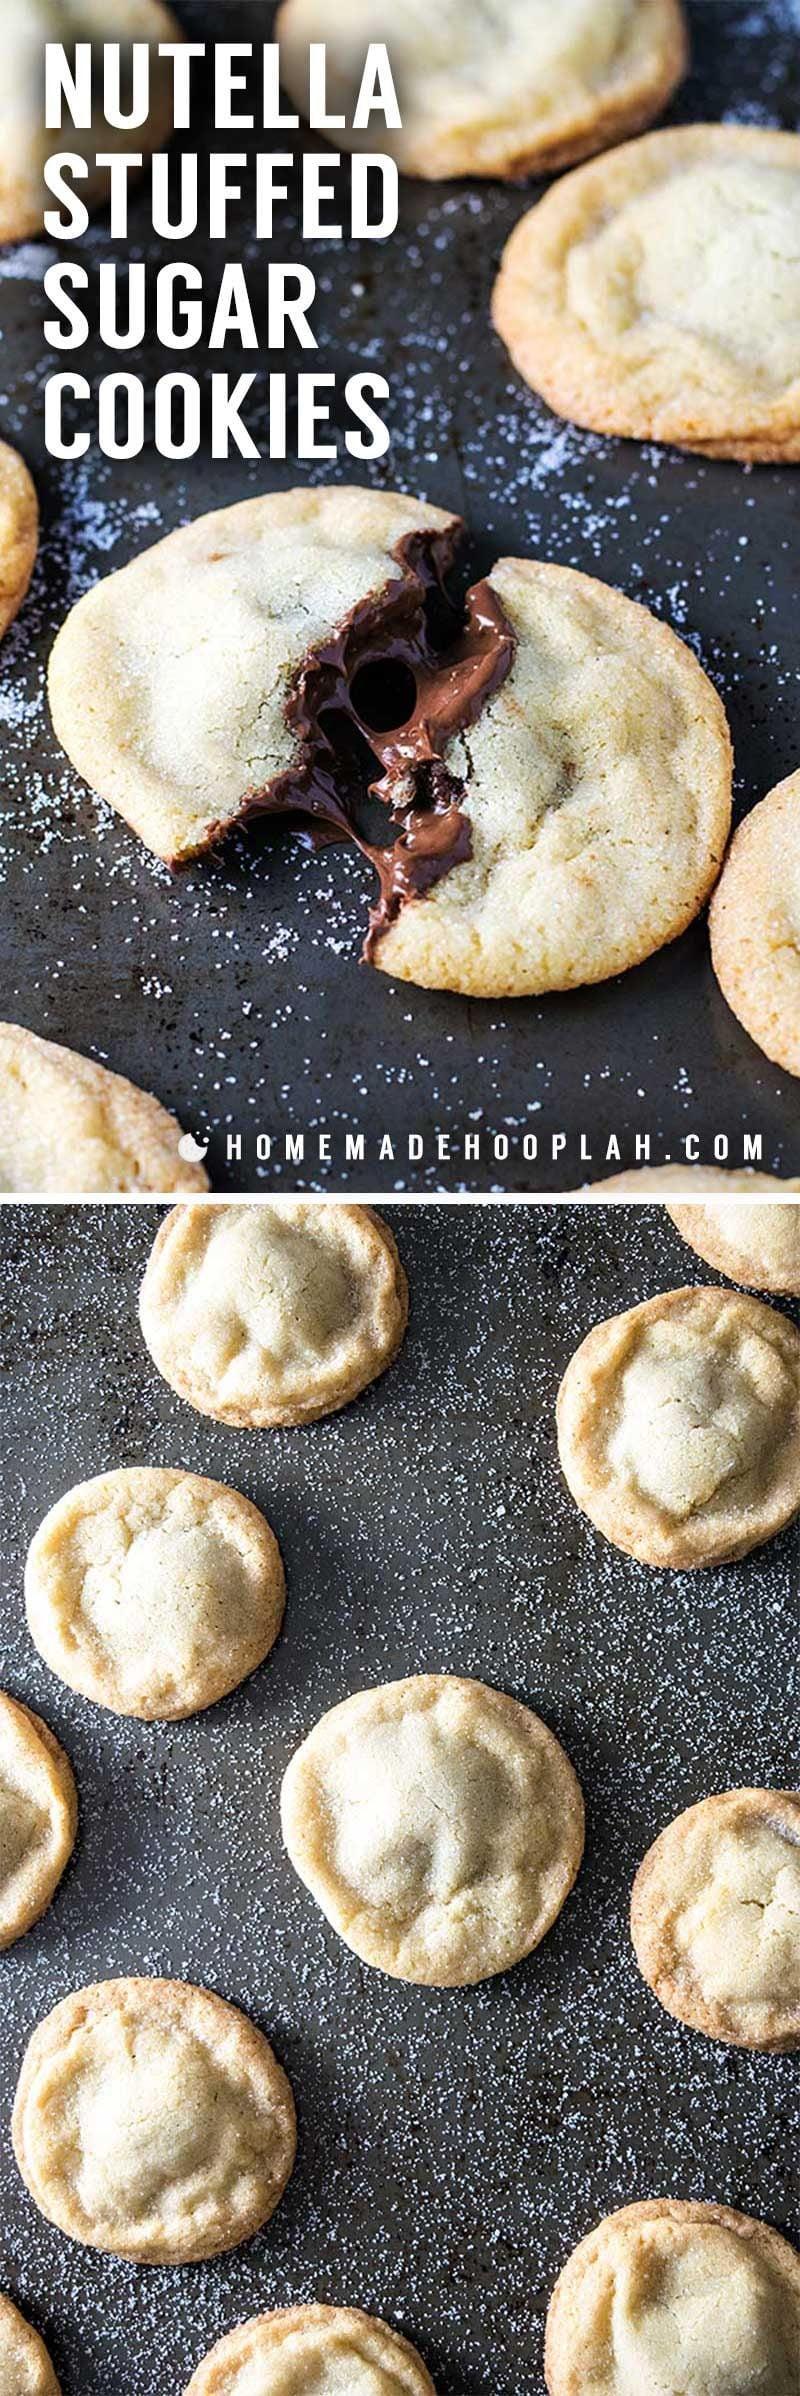 Easy Nutella stuffed cookie recipe.